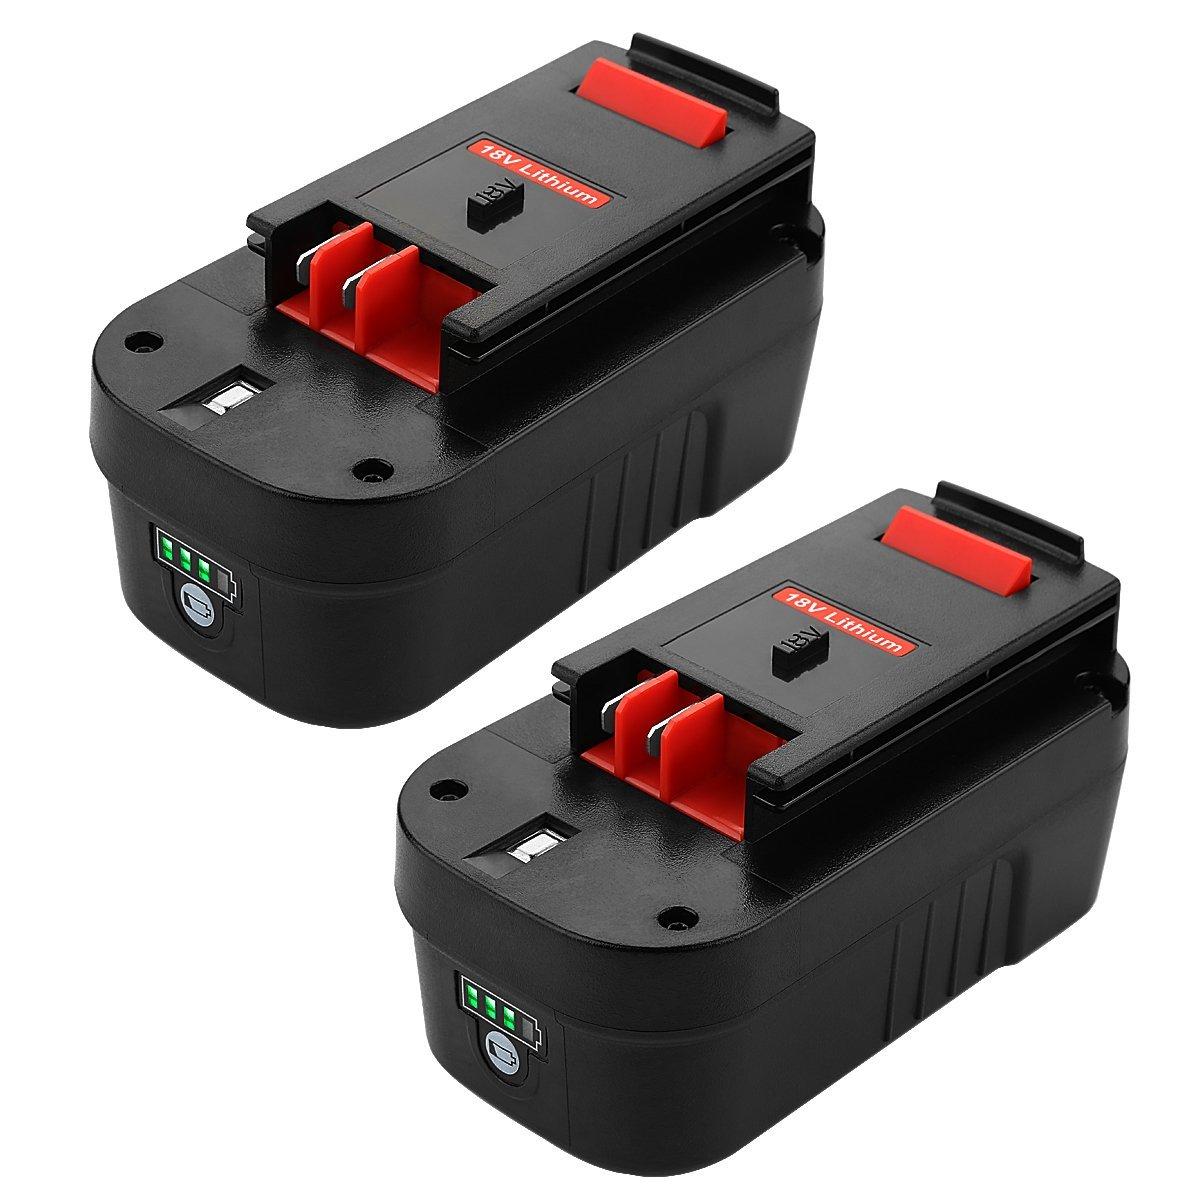 ANTRobut Replacement for 5000mAh Lith-ion 18Volt Replacement Battery for black&decker 18v battery HPB18 HPB18-OPE 244760-00 A1718 FS18FL FSB18 Firestorm black & decker 18 volt batteries (2 Pack)